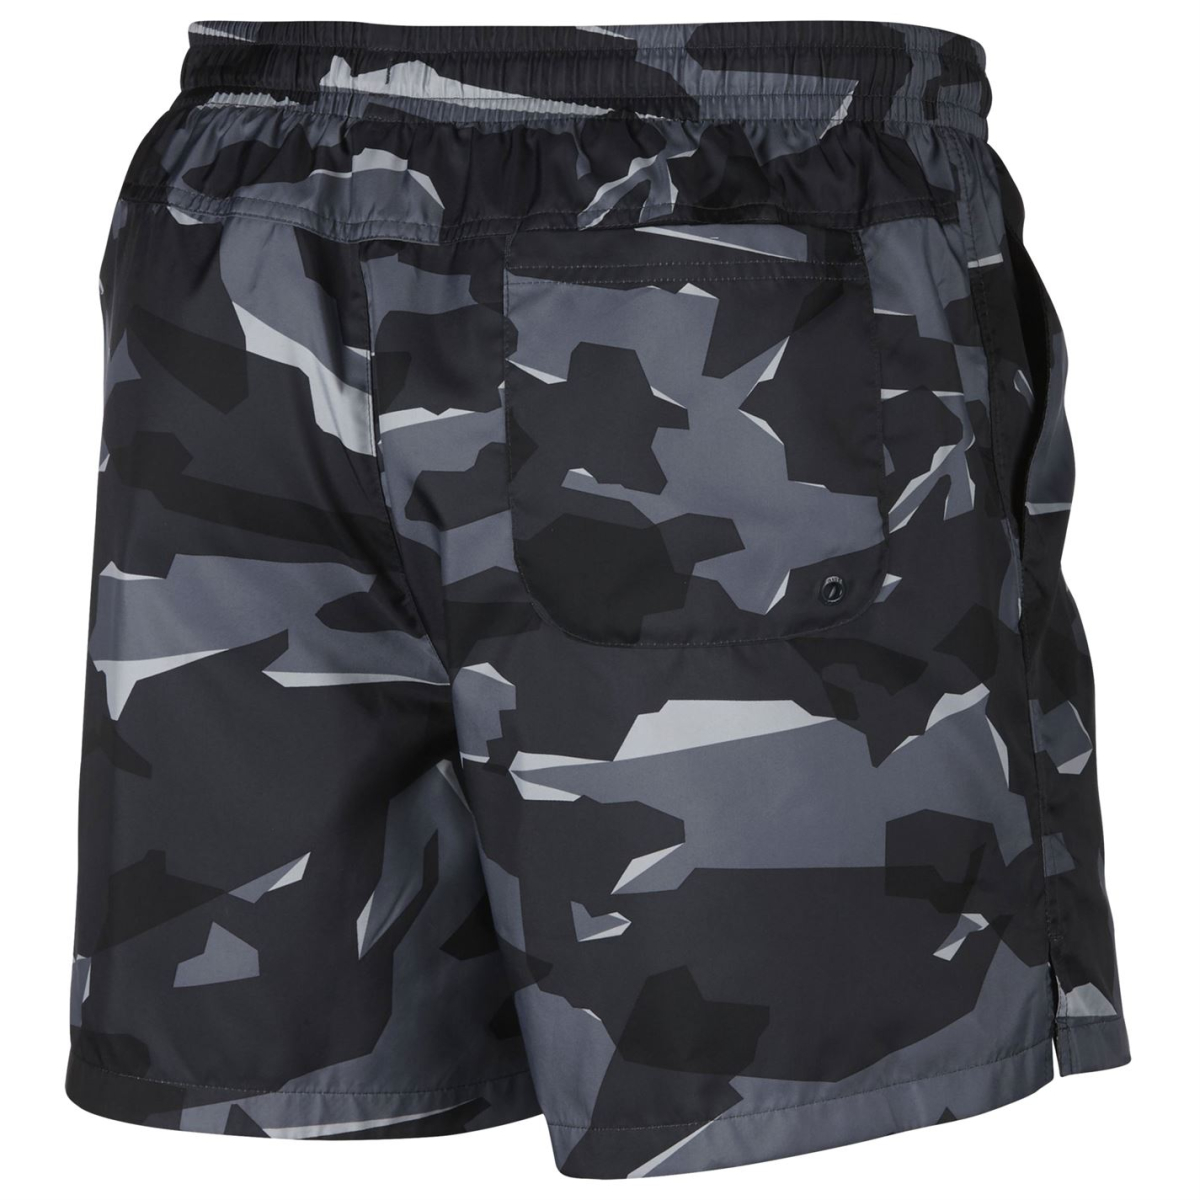 Details zu Nike Camo Herren Shorts Sporthose Kurzhose Bermuda Sport Hose 1035